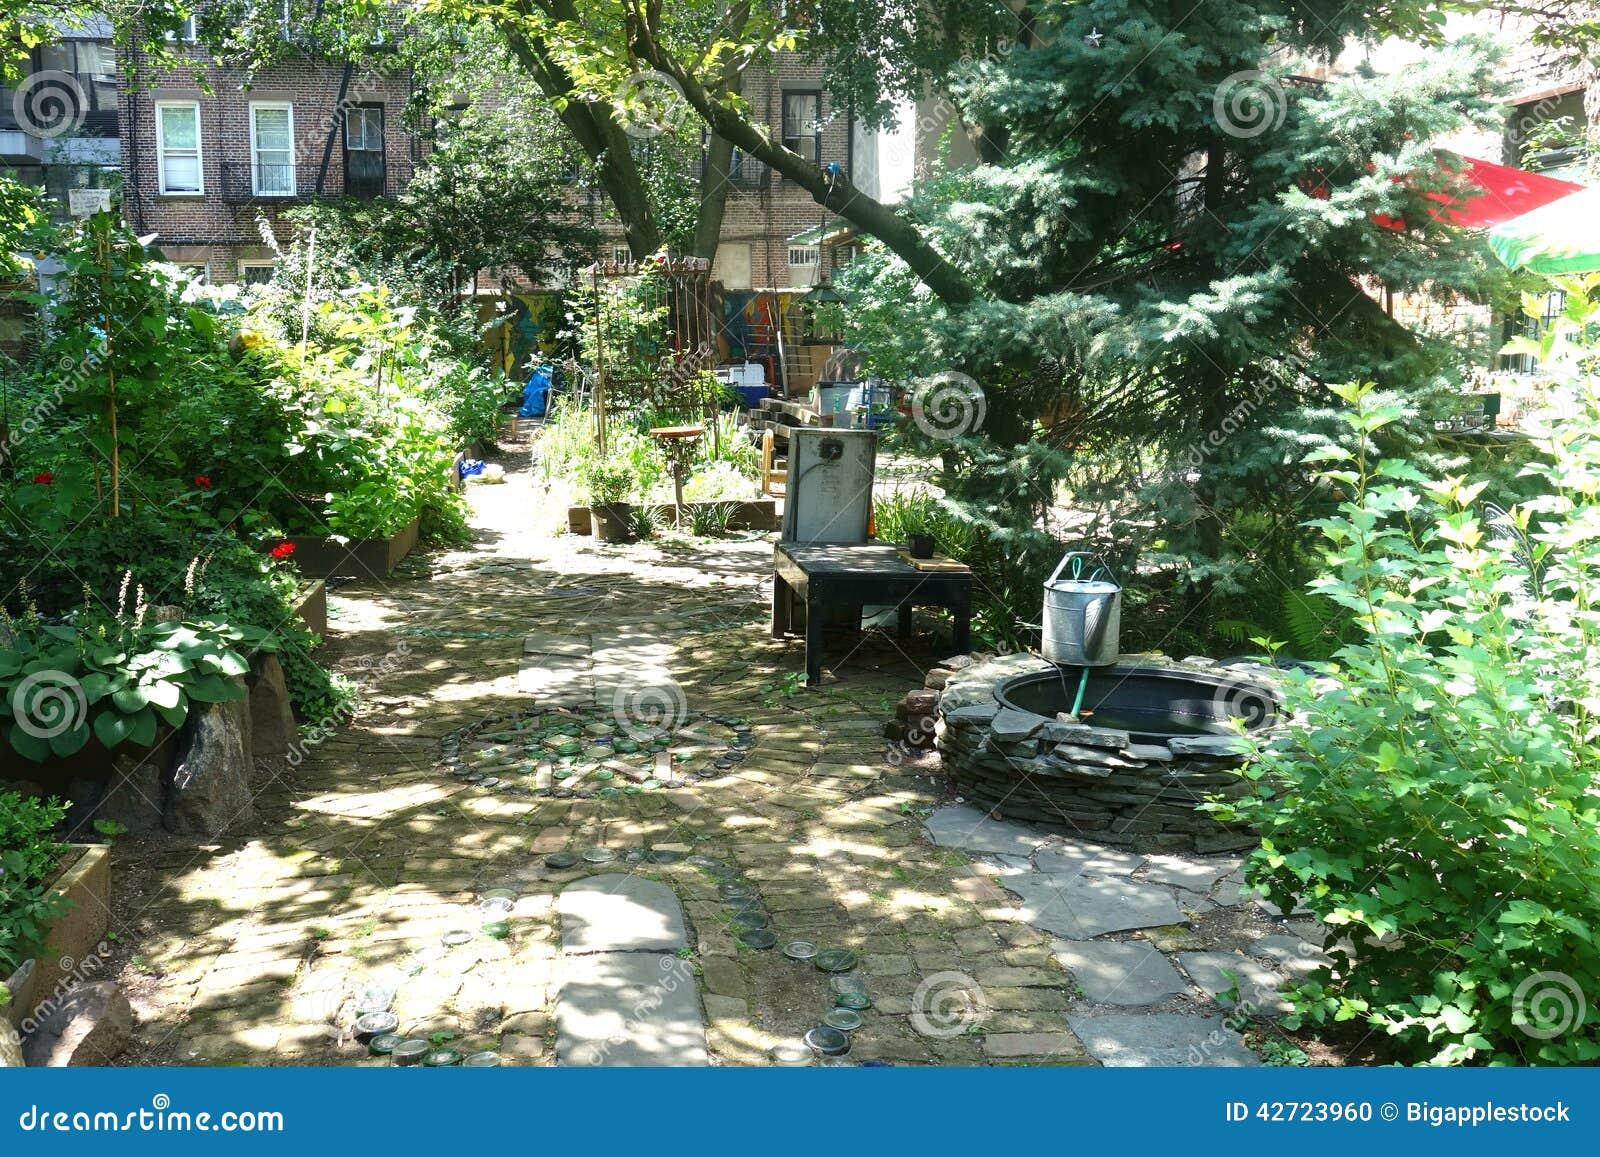 New York City Community Garden Editorial Image Image 42723960